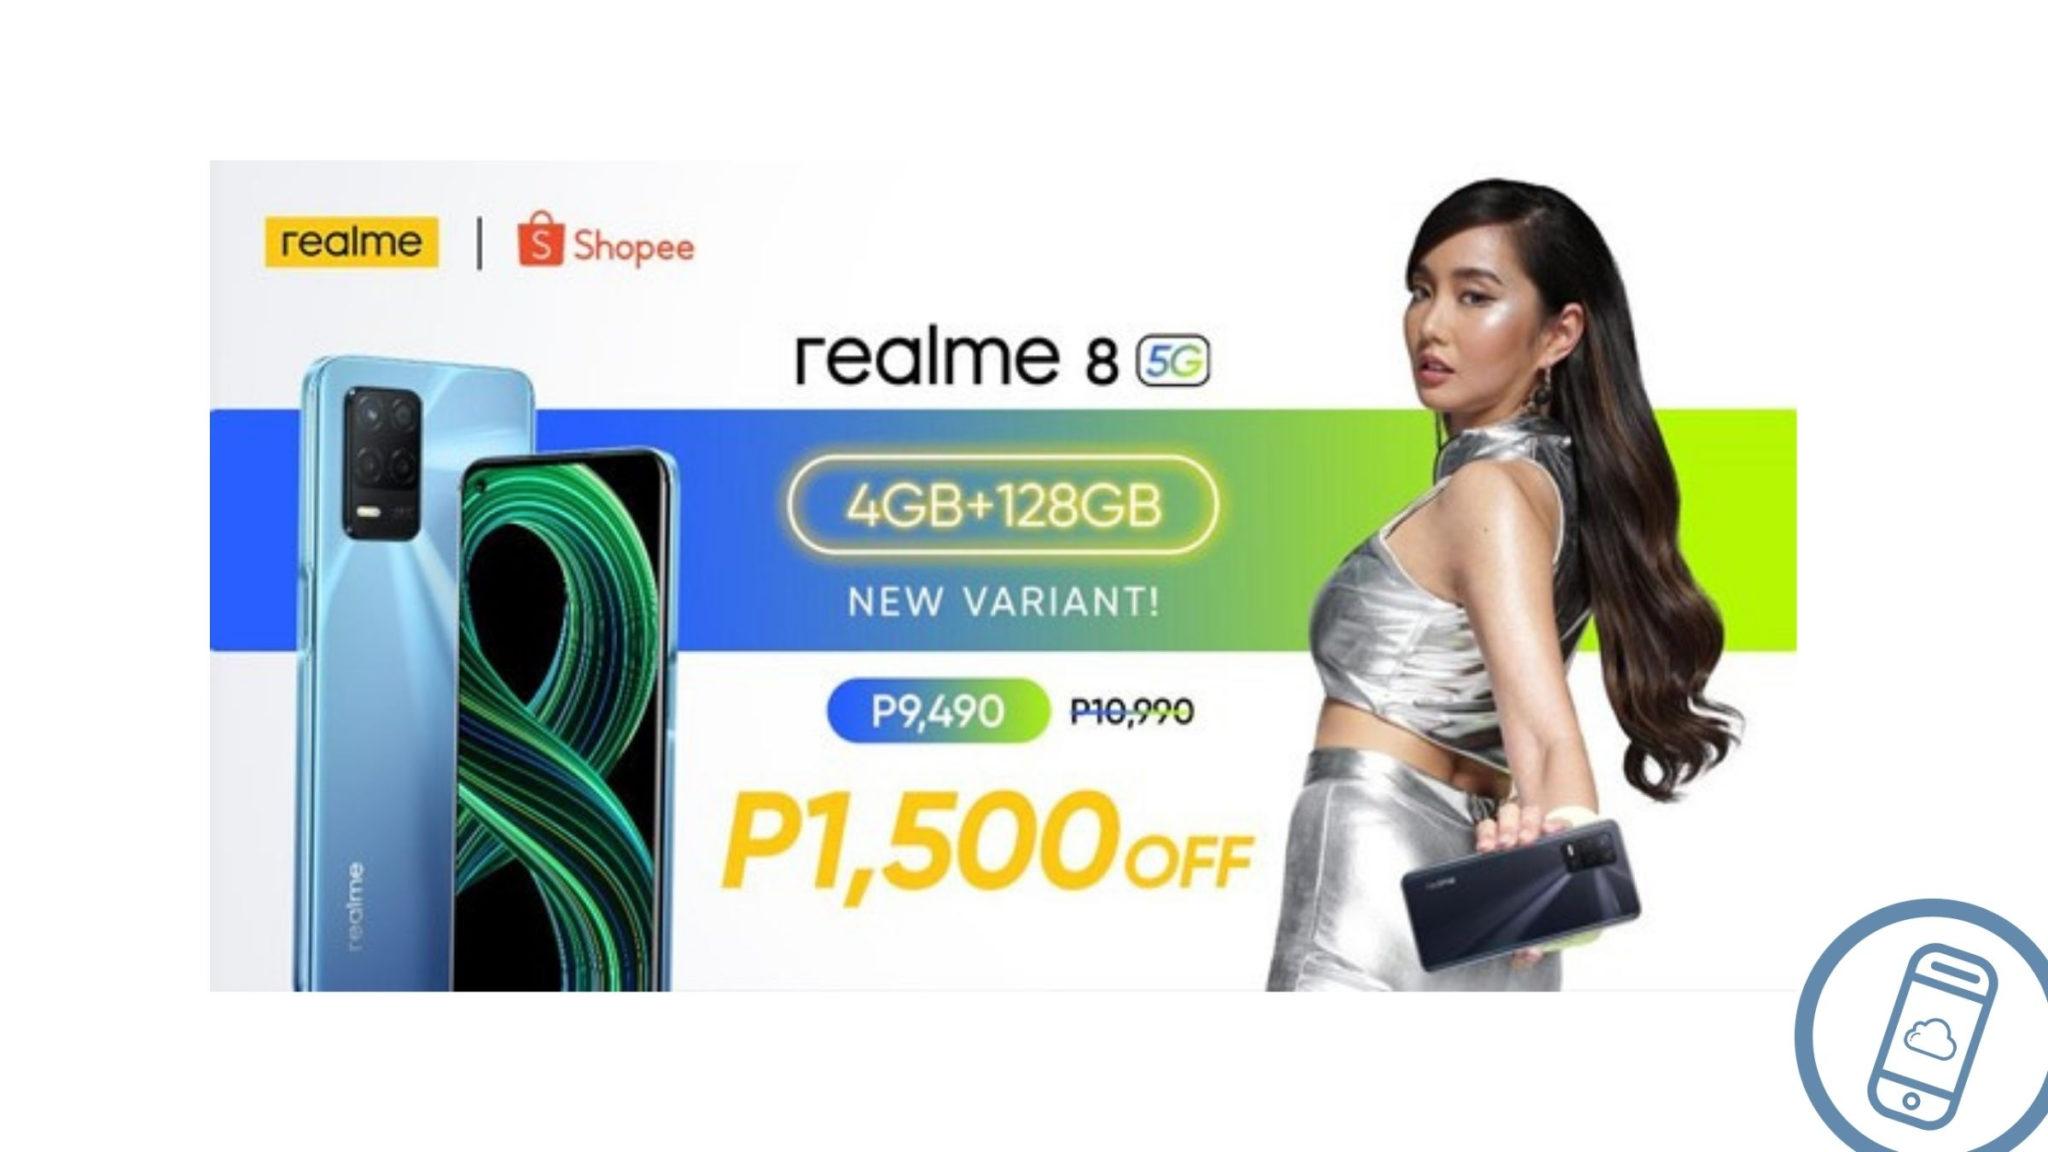 realme 8 5G 4GB + 128GB Philippines Header